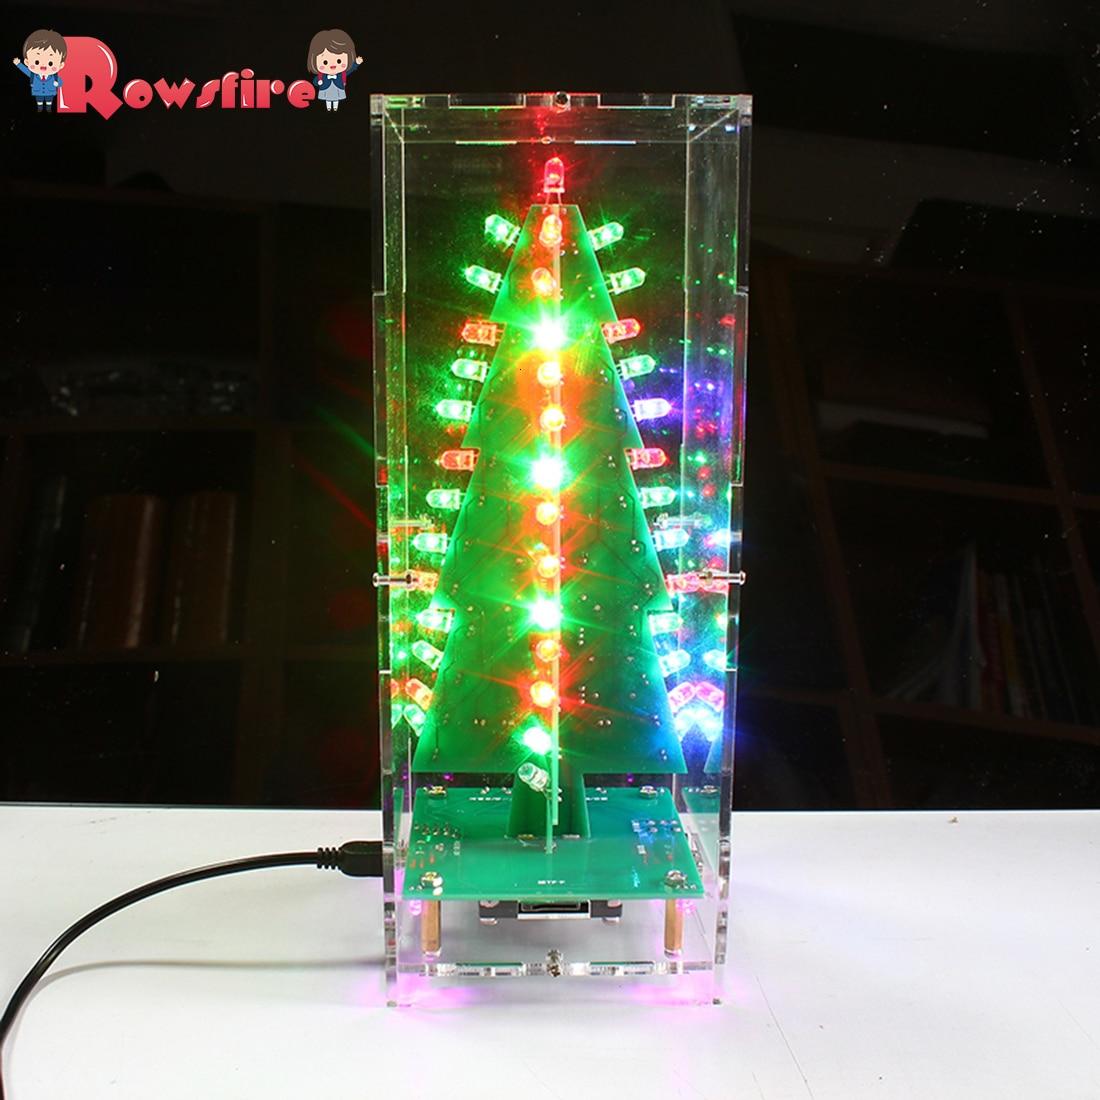 DIY Colorful LED Display Lamp DIY Welding Light Kits DIY Lamp Brain-Training Toy - Flash Tree